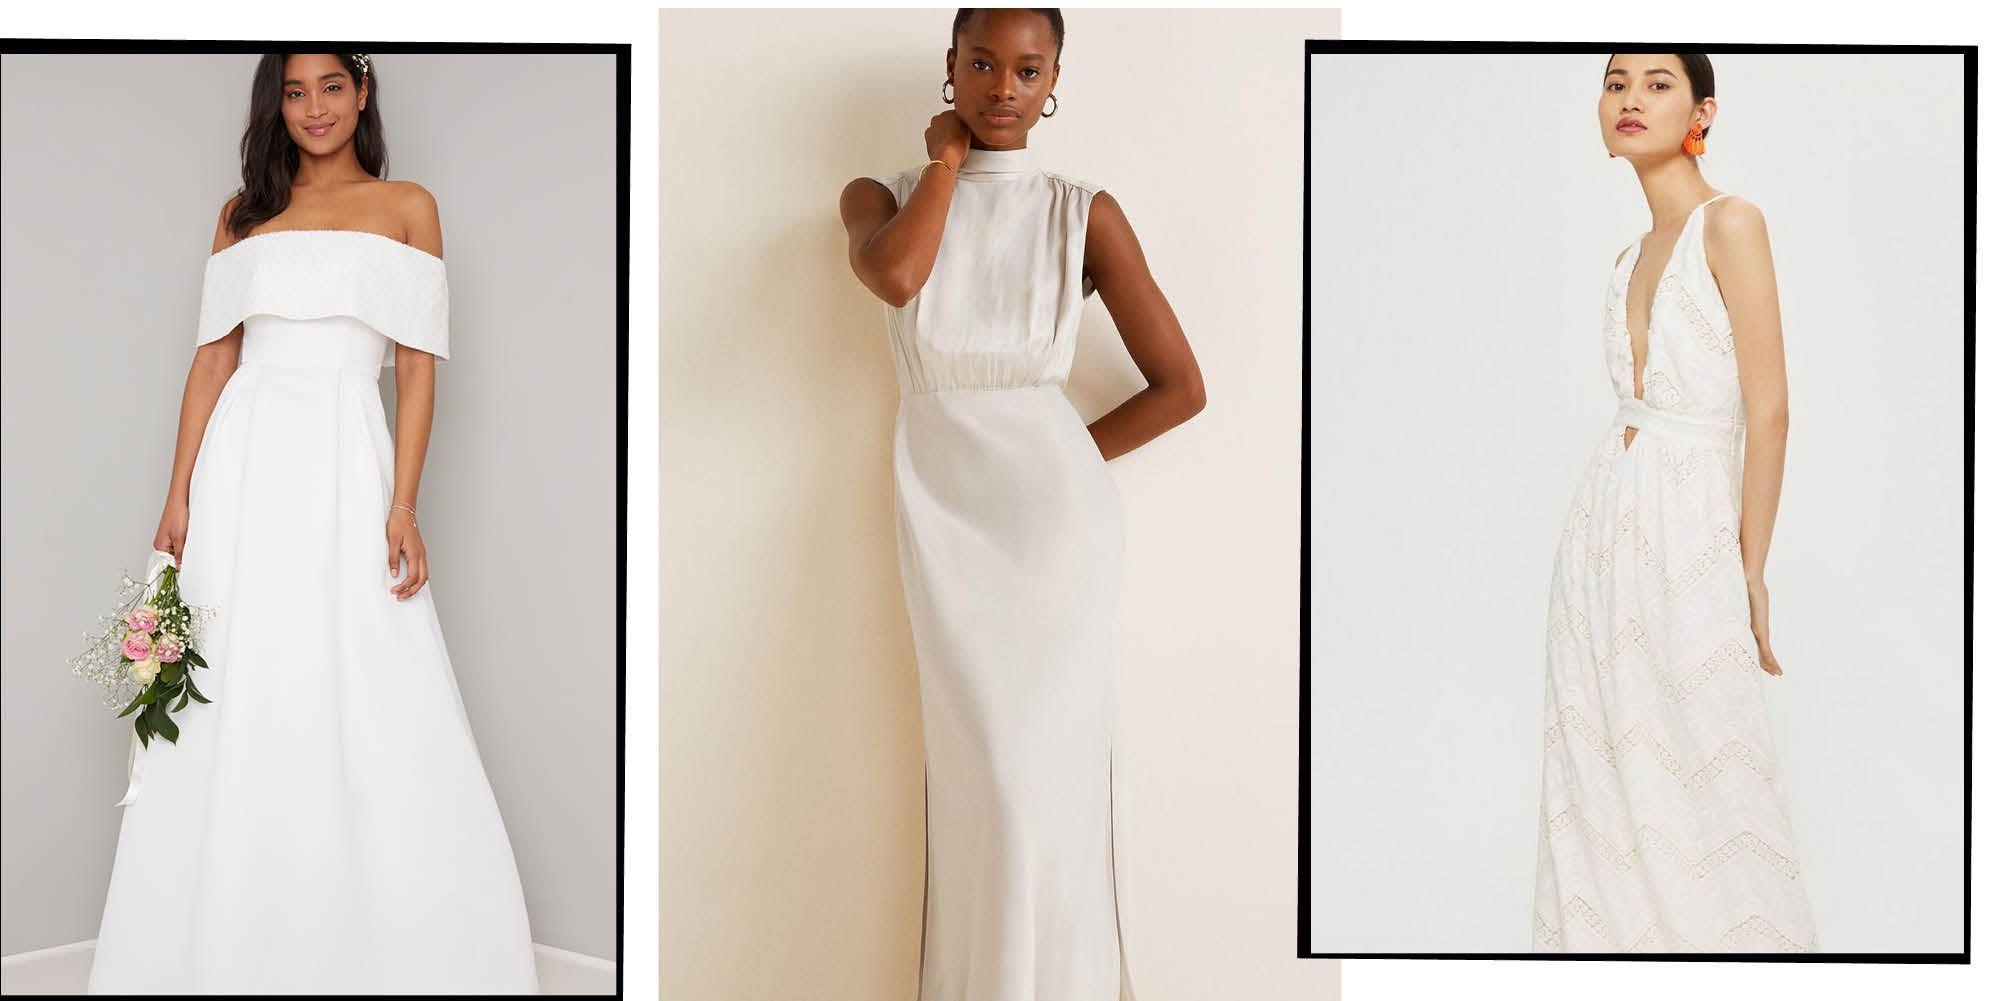 affordable wedding dress - best high street wedding dress